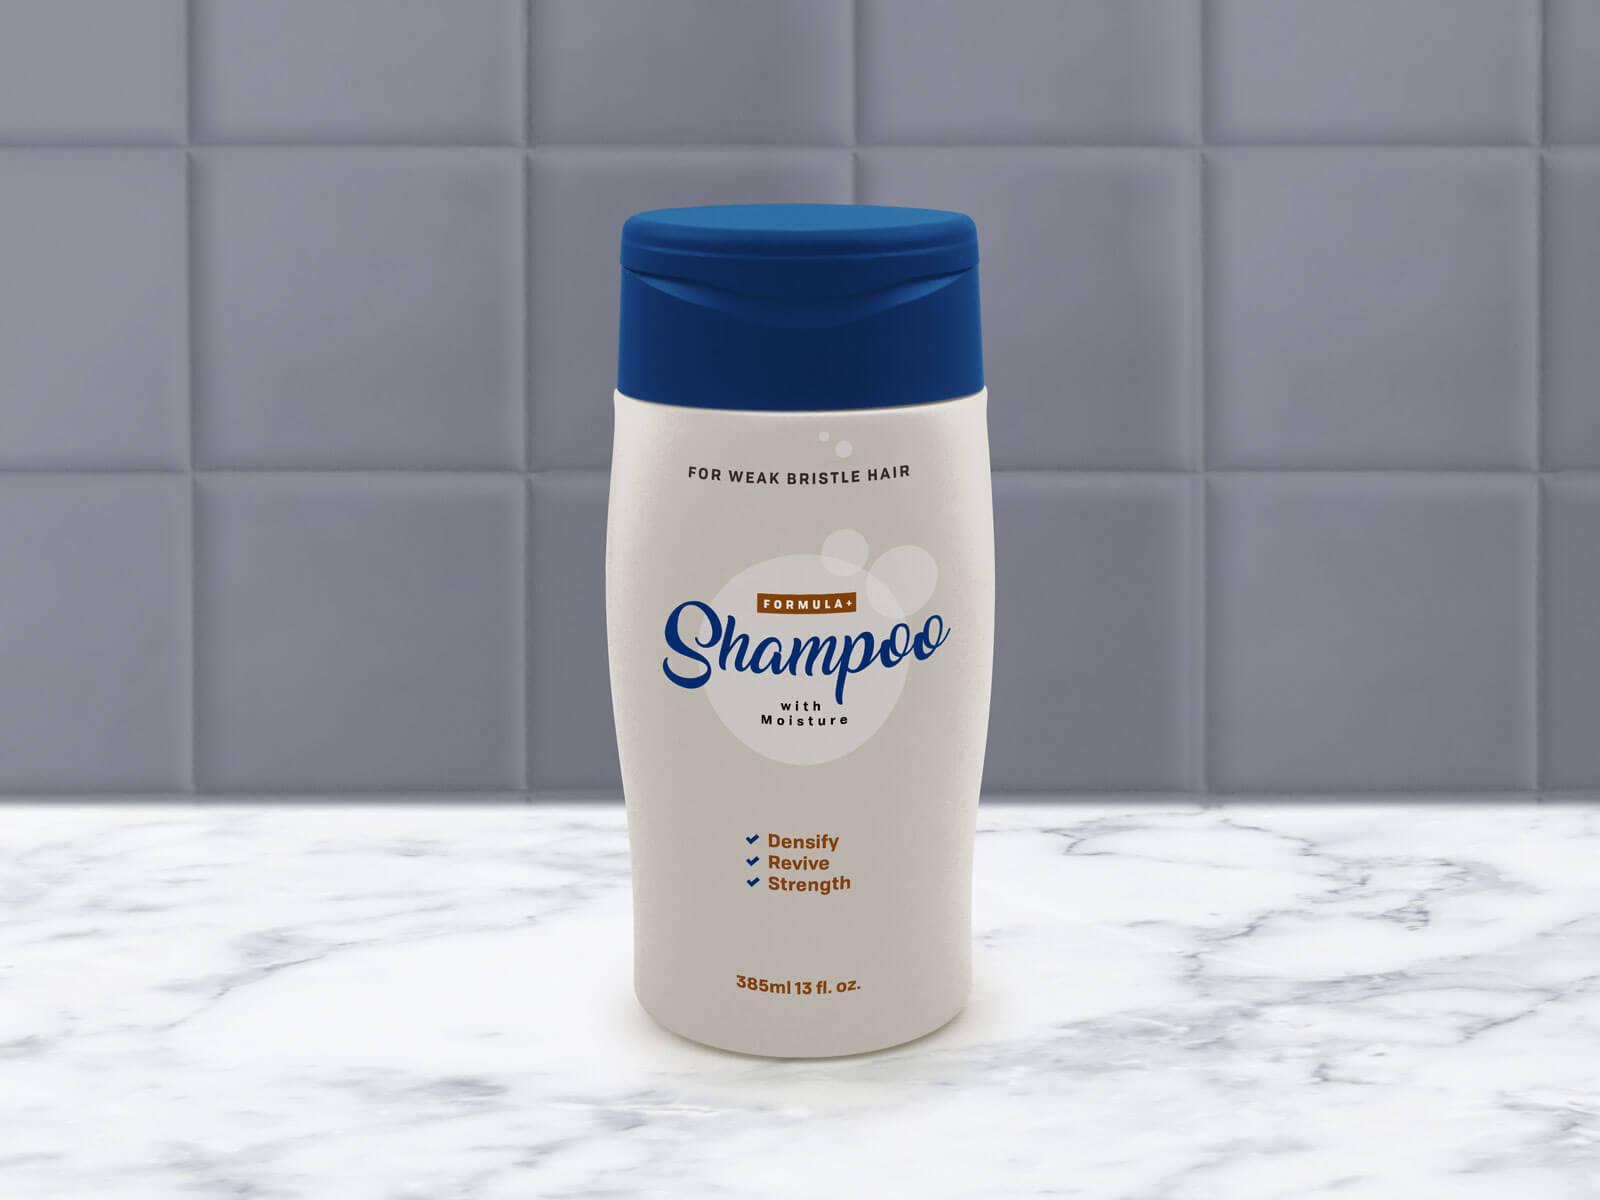 Free-Shampoo-Bottle-Mockup-PSD